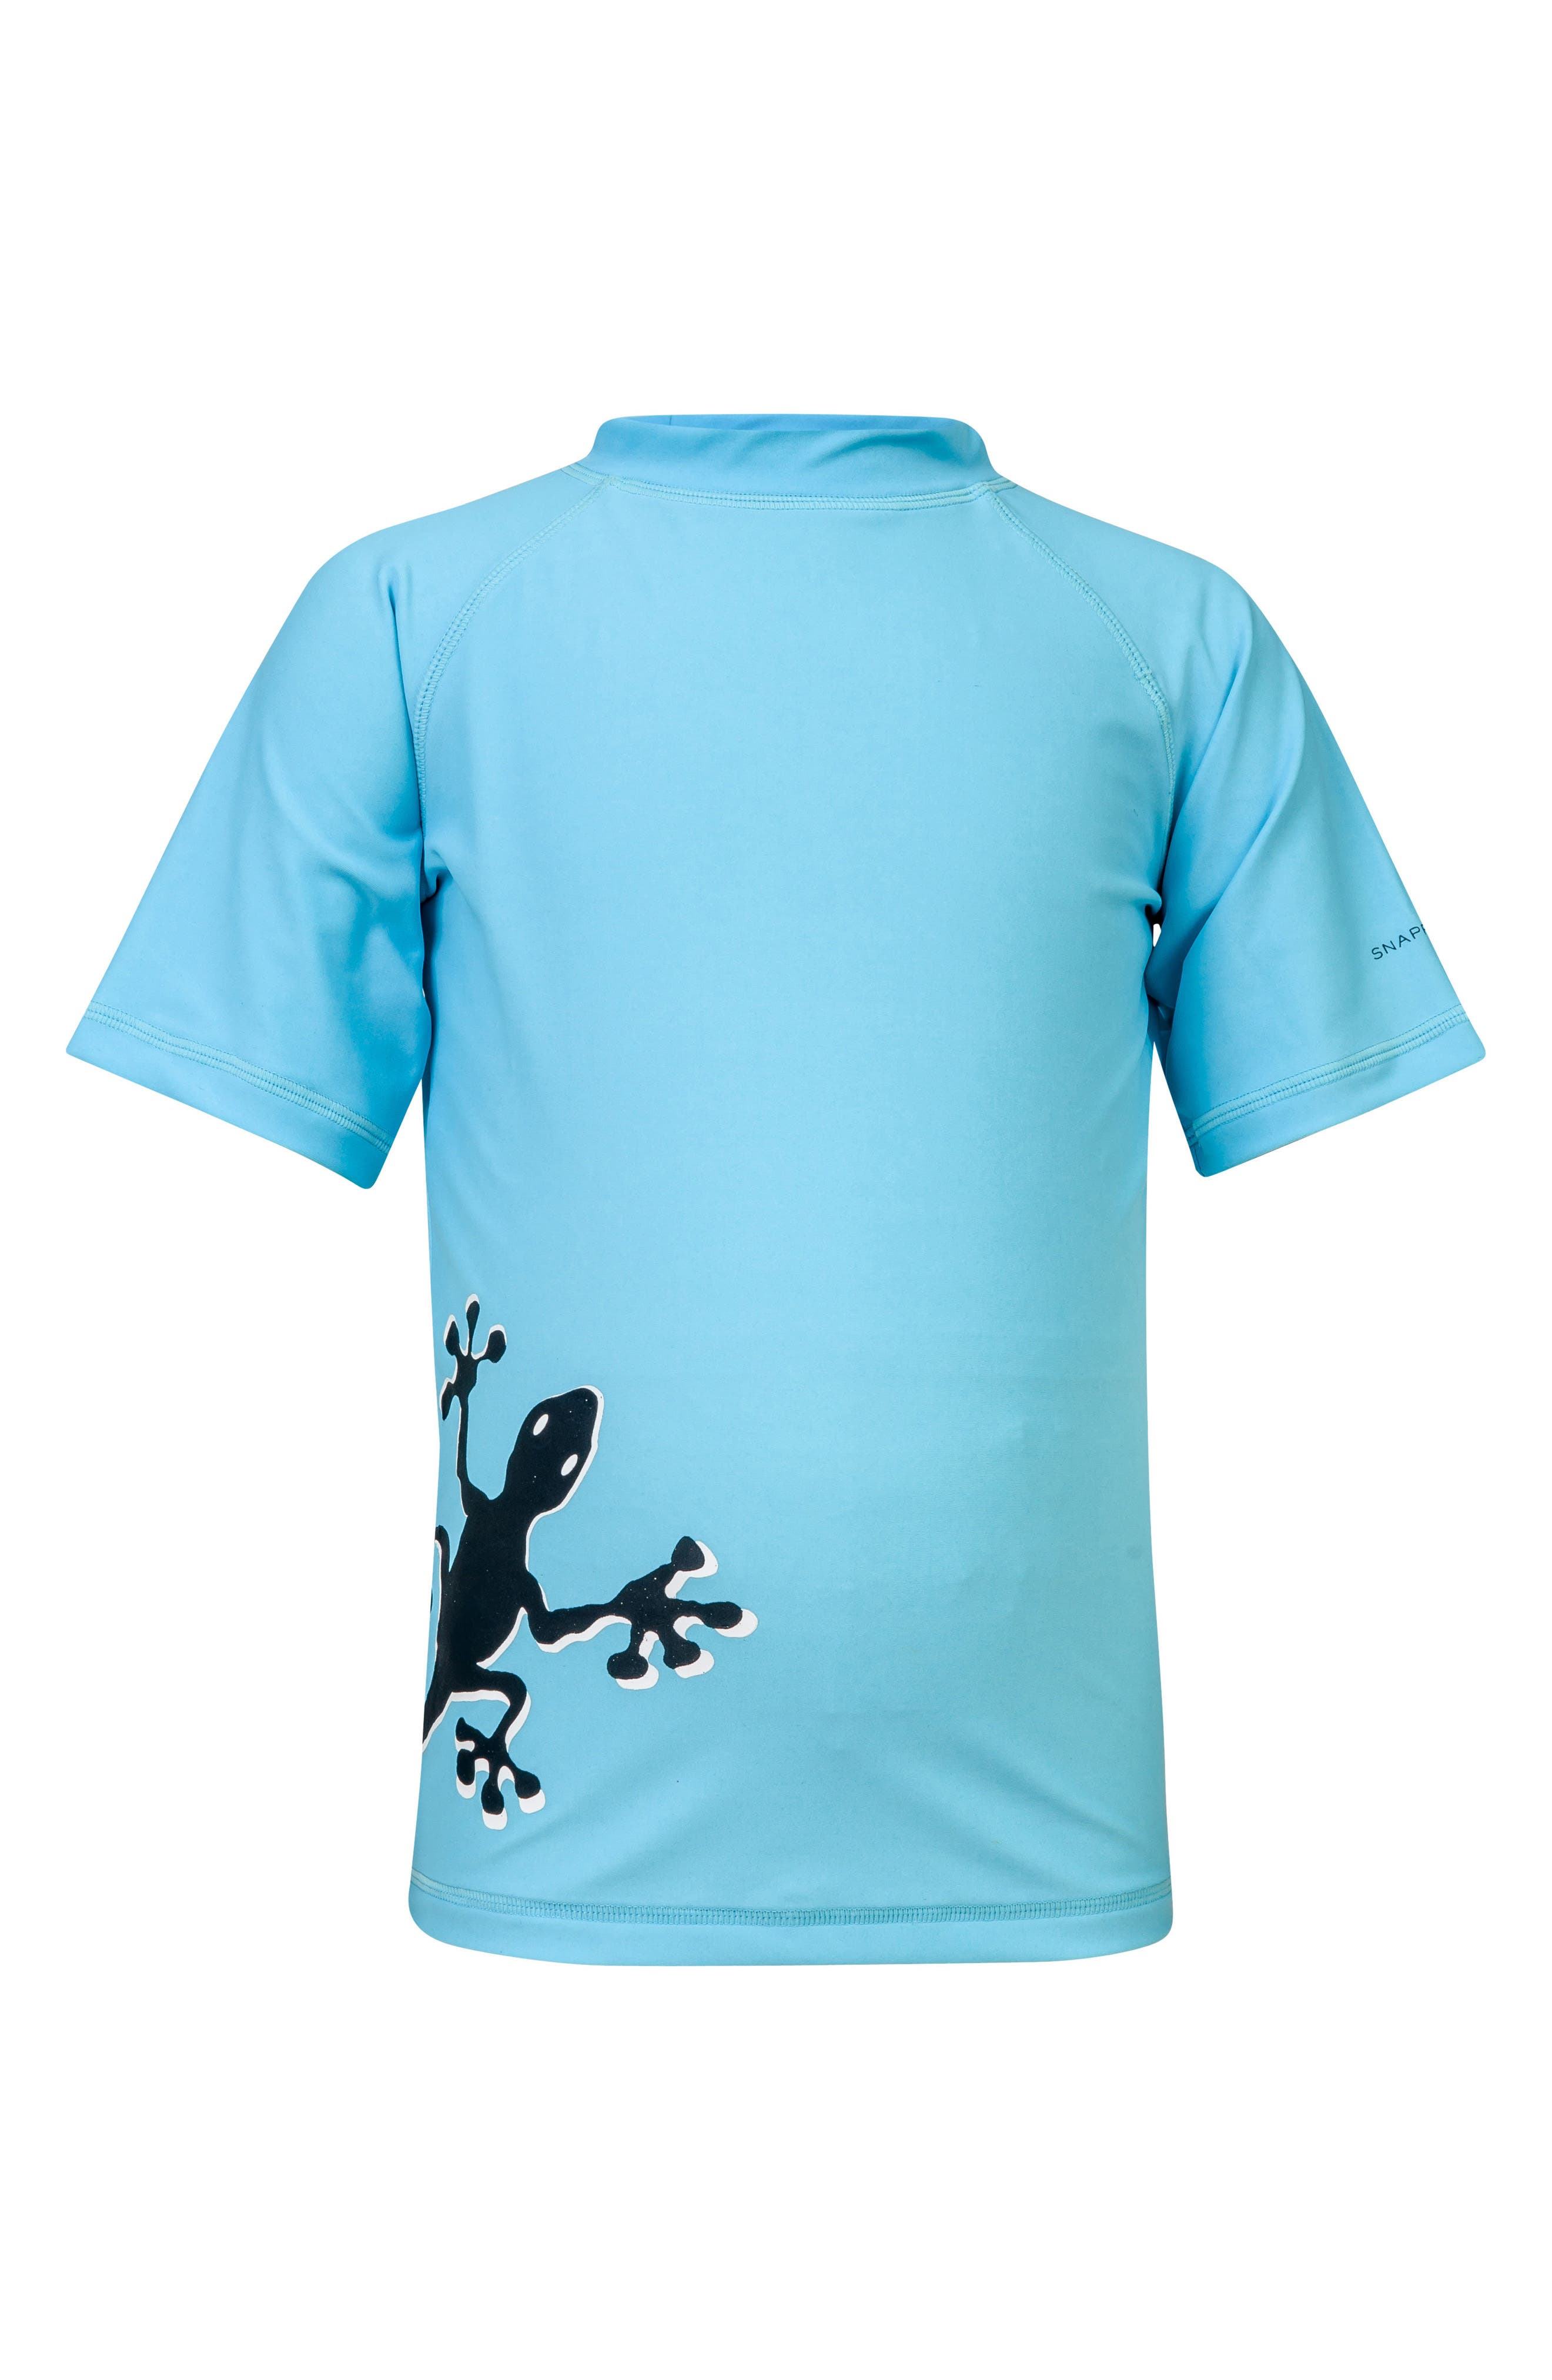 Gecko Short Sleeve Rashguard,                             Main thumbnail 1, color,                             AQUA BLUE